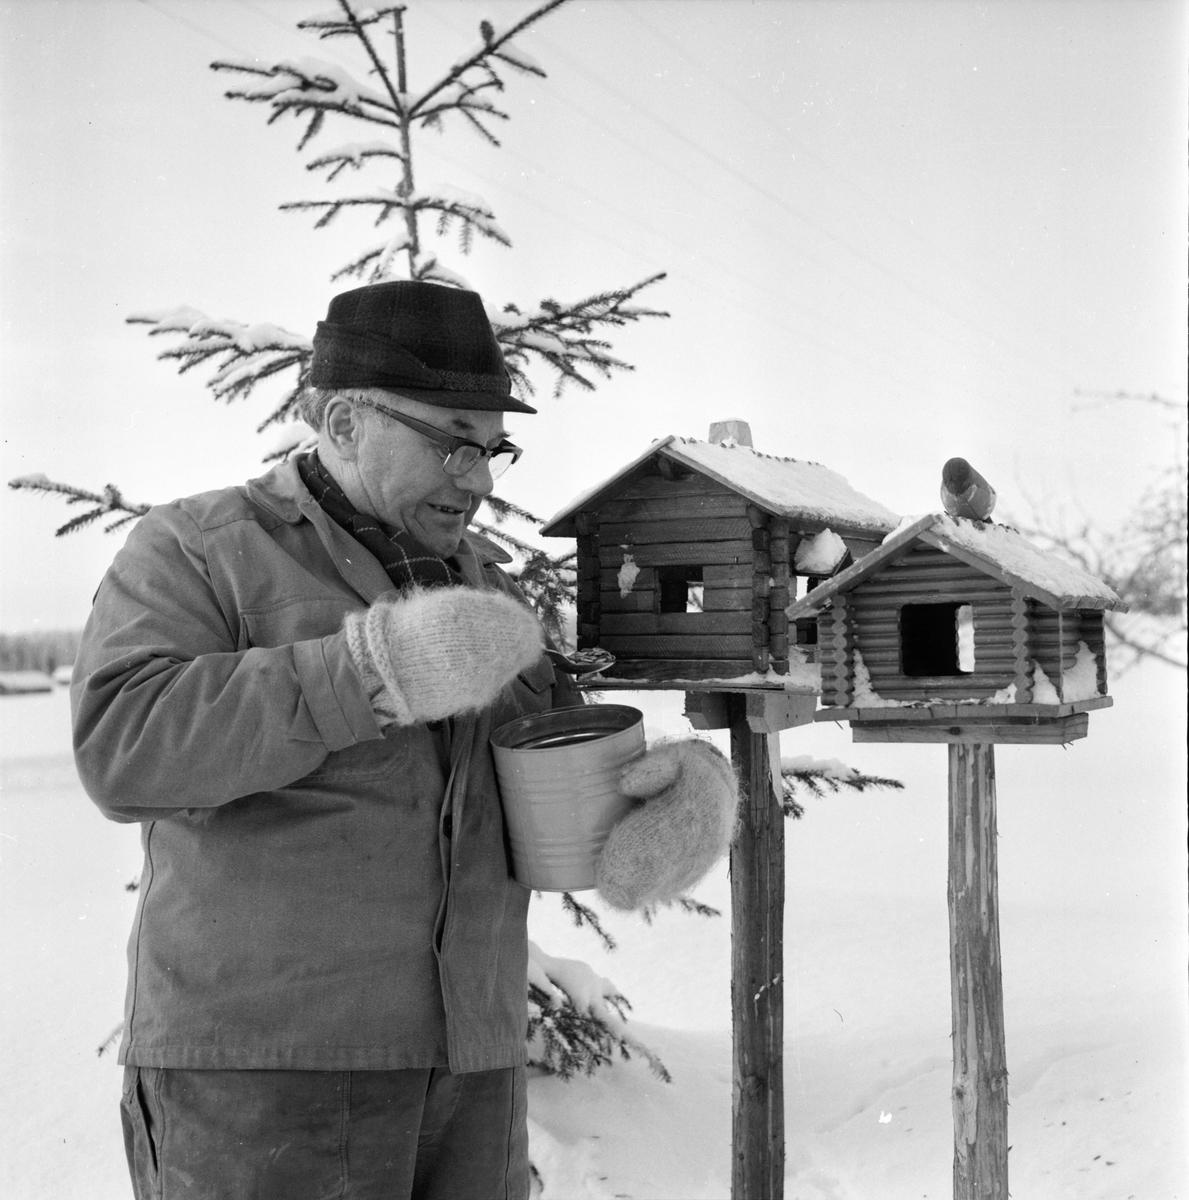 Rådjurshjälpen sjuk get. Växsjö Einar Bungs Röste 7/2-1966